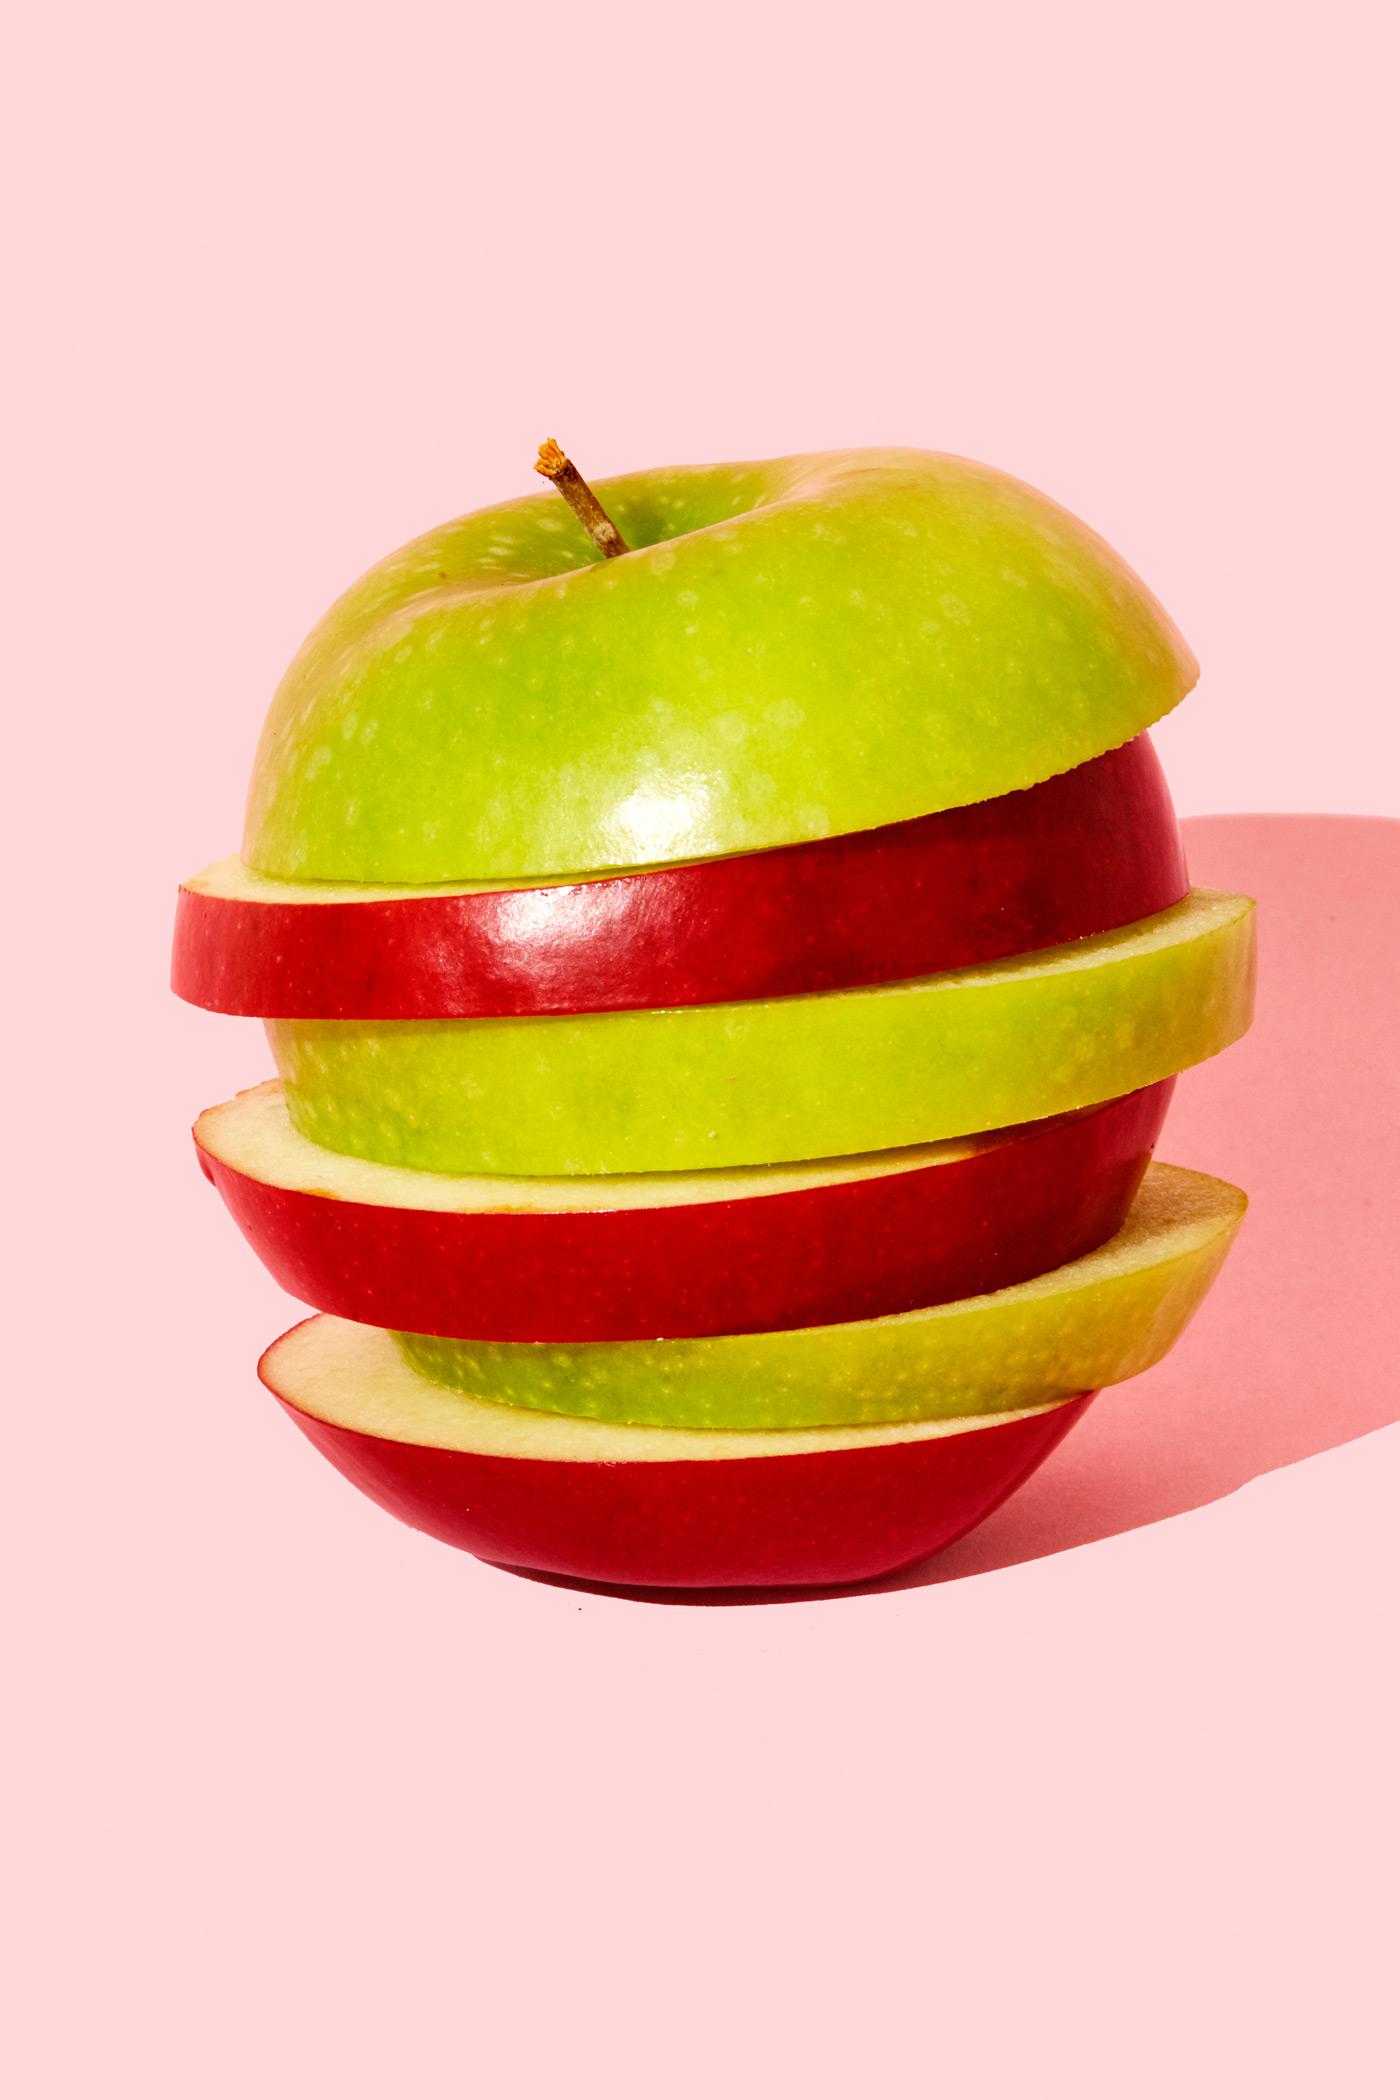 healthiest foods, health food, diet, nutrition, time.com stock, apple